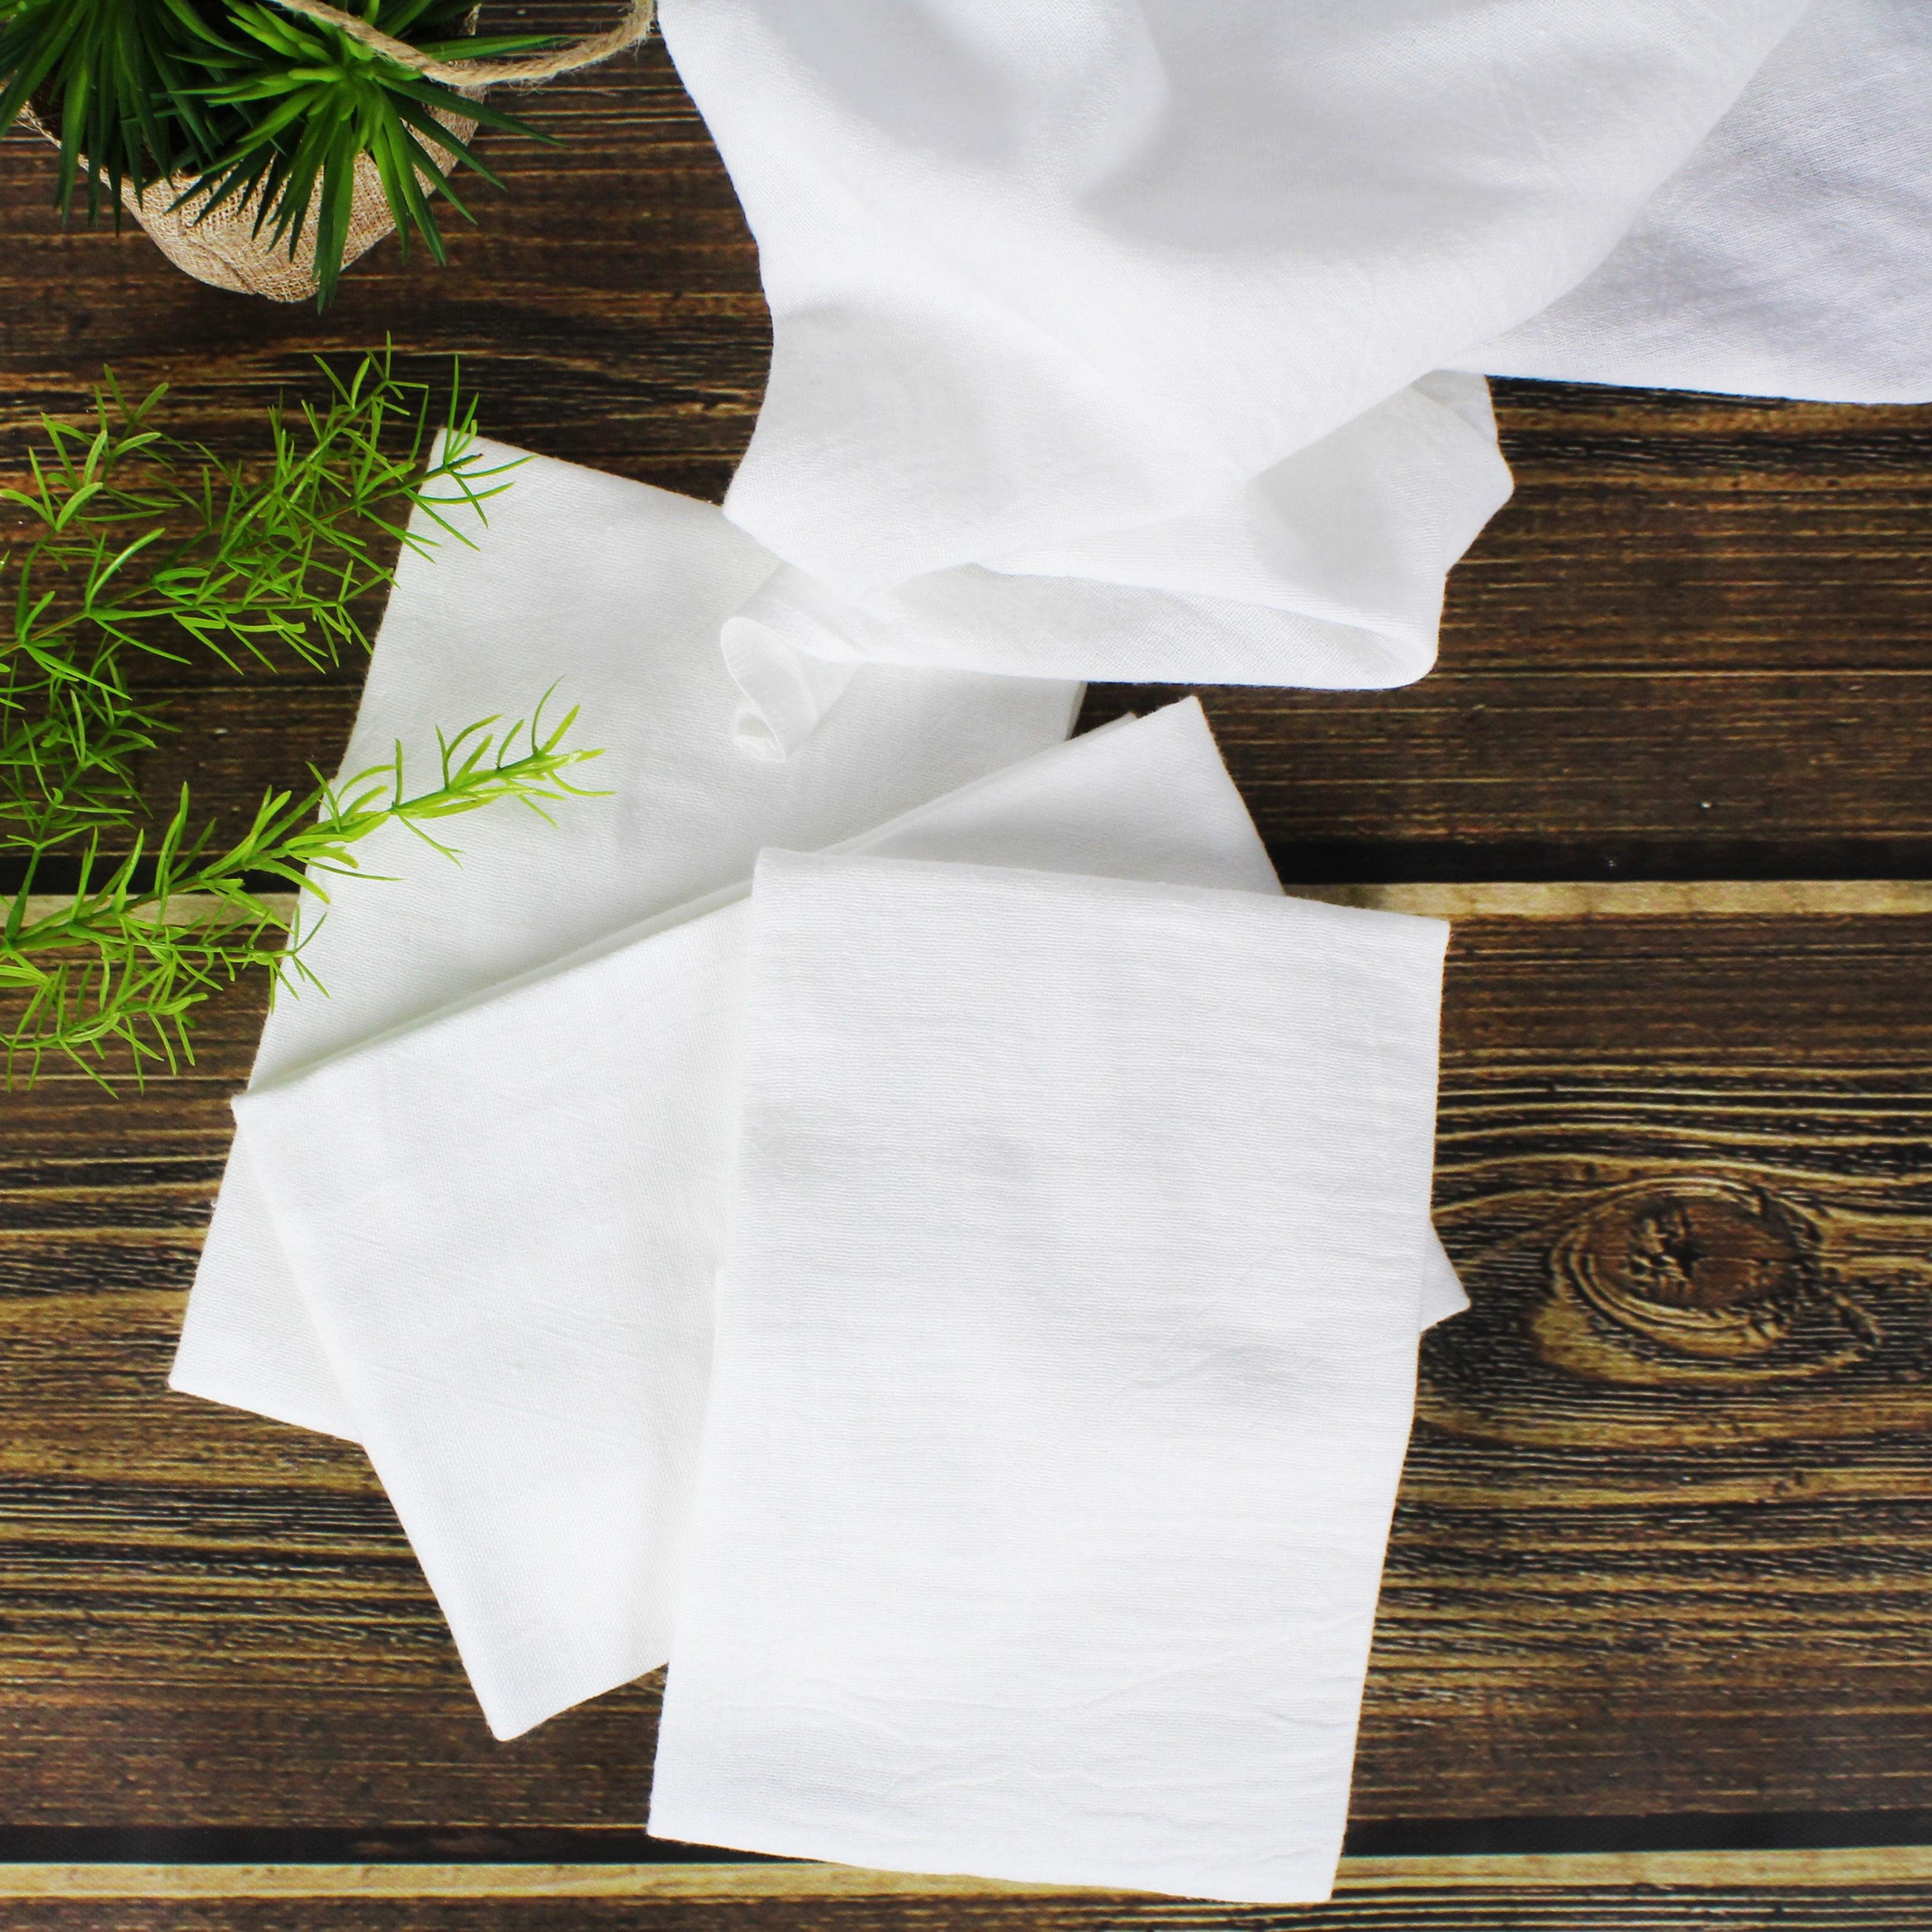 Mainstays Flour Sack White Kitchen Towel, 5 Count   Walmart.com